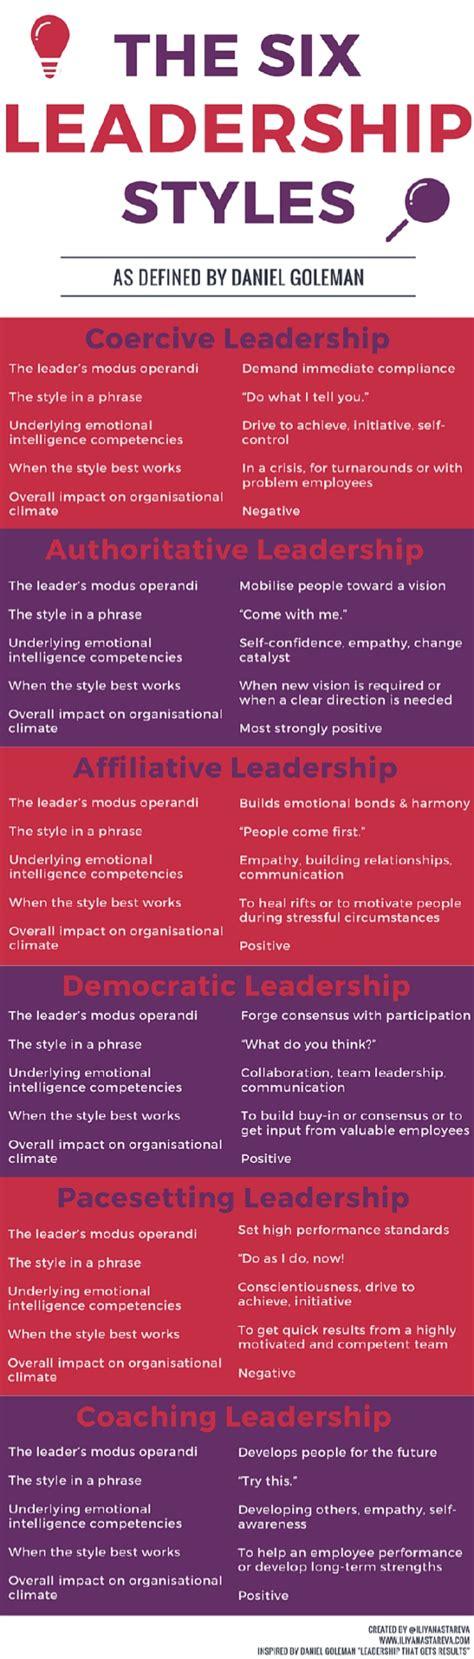 leadership styles infographic